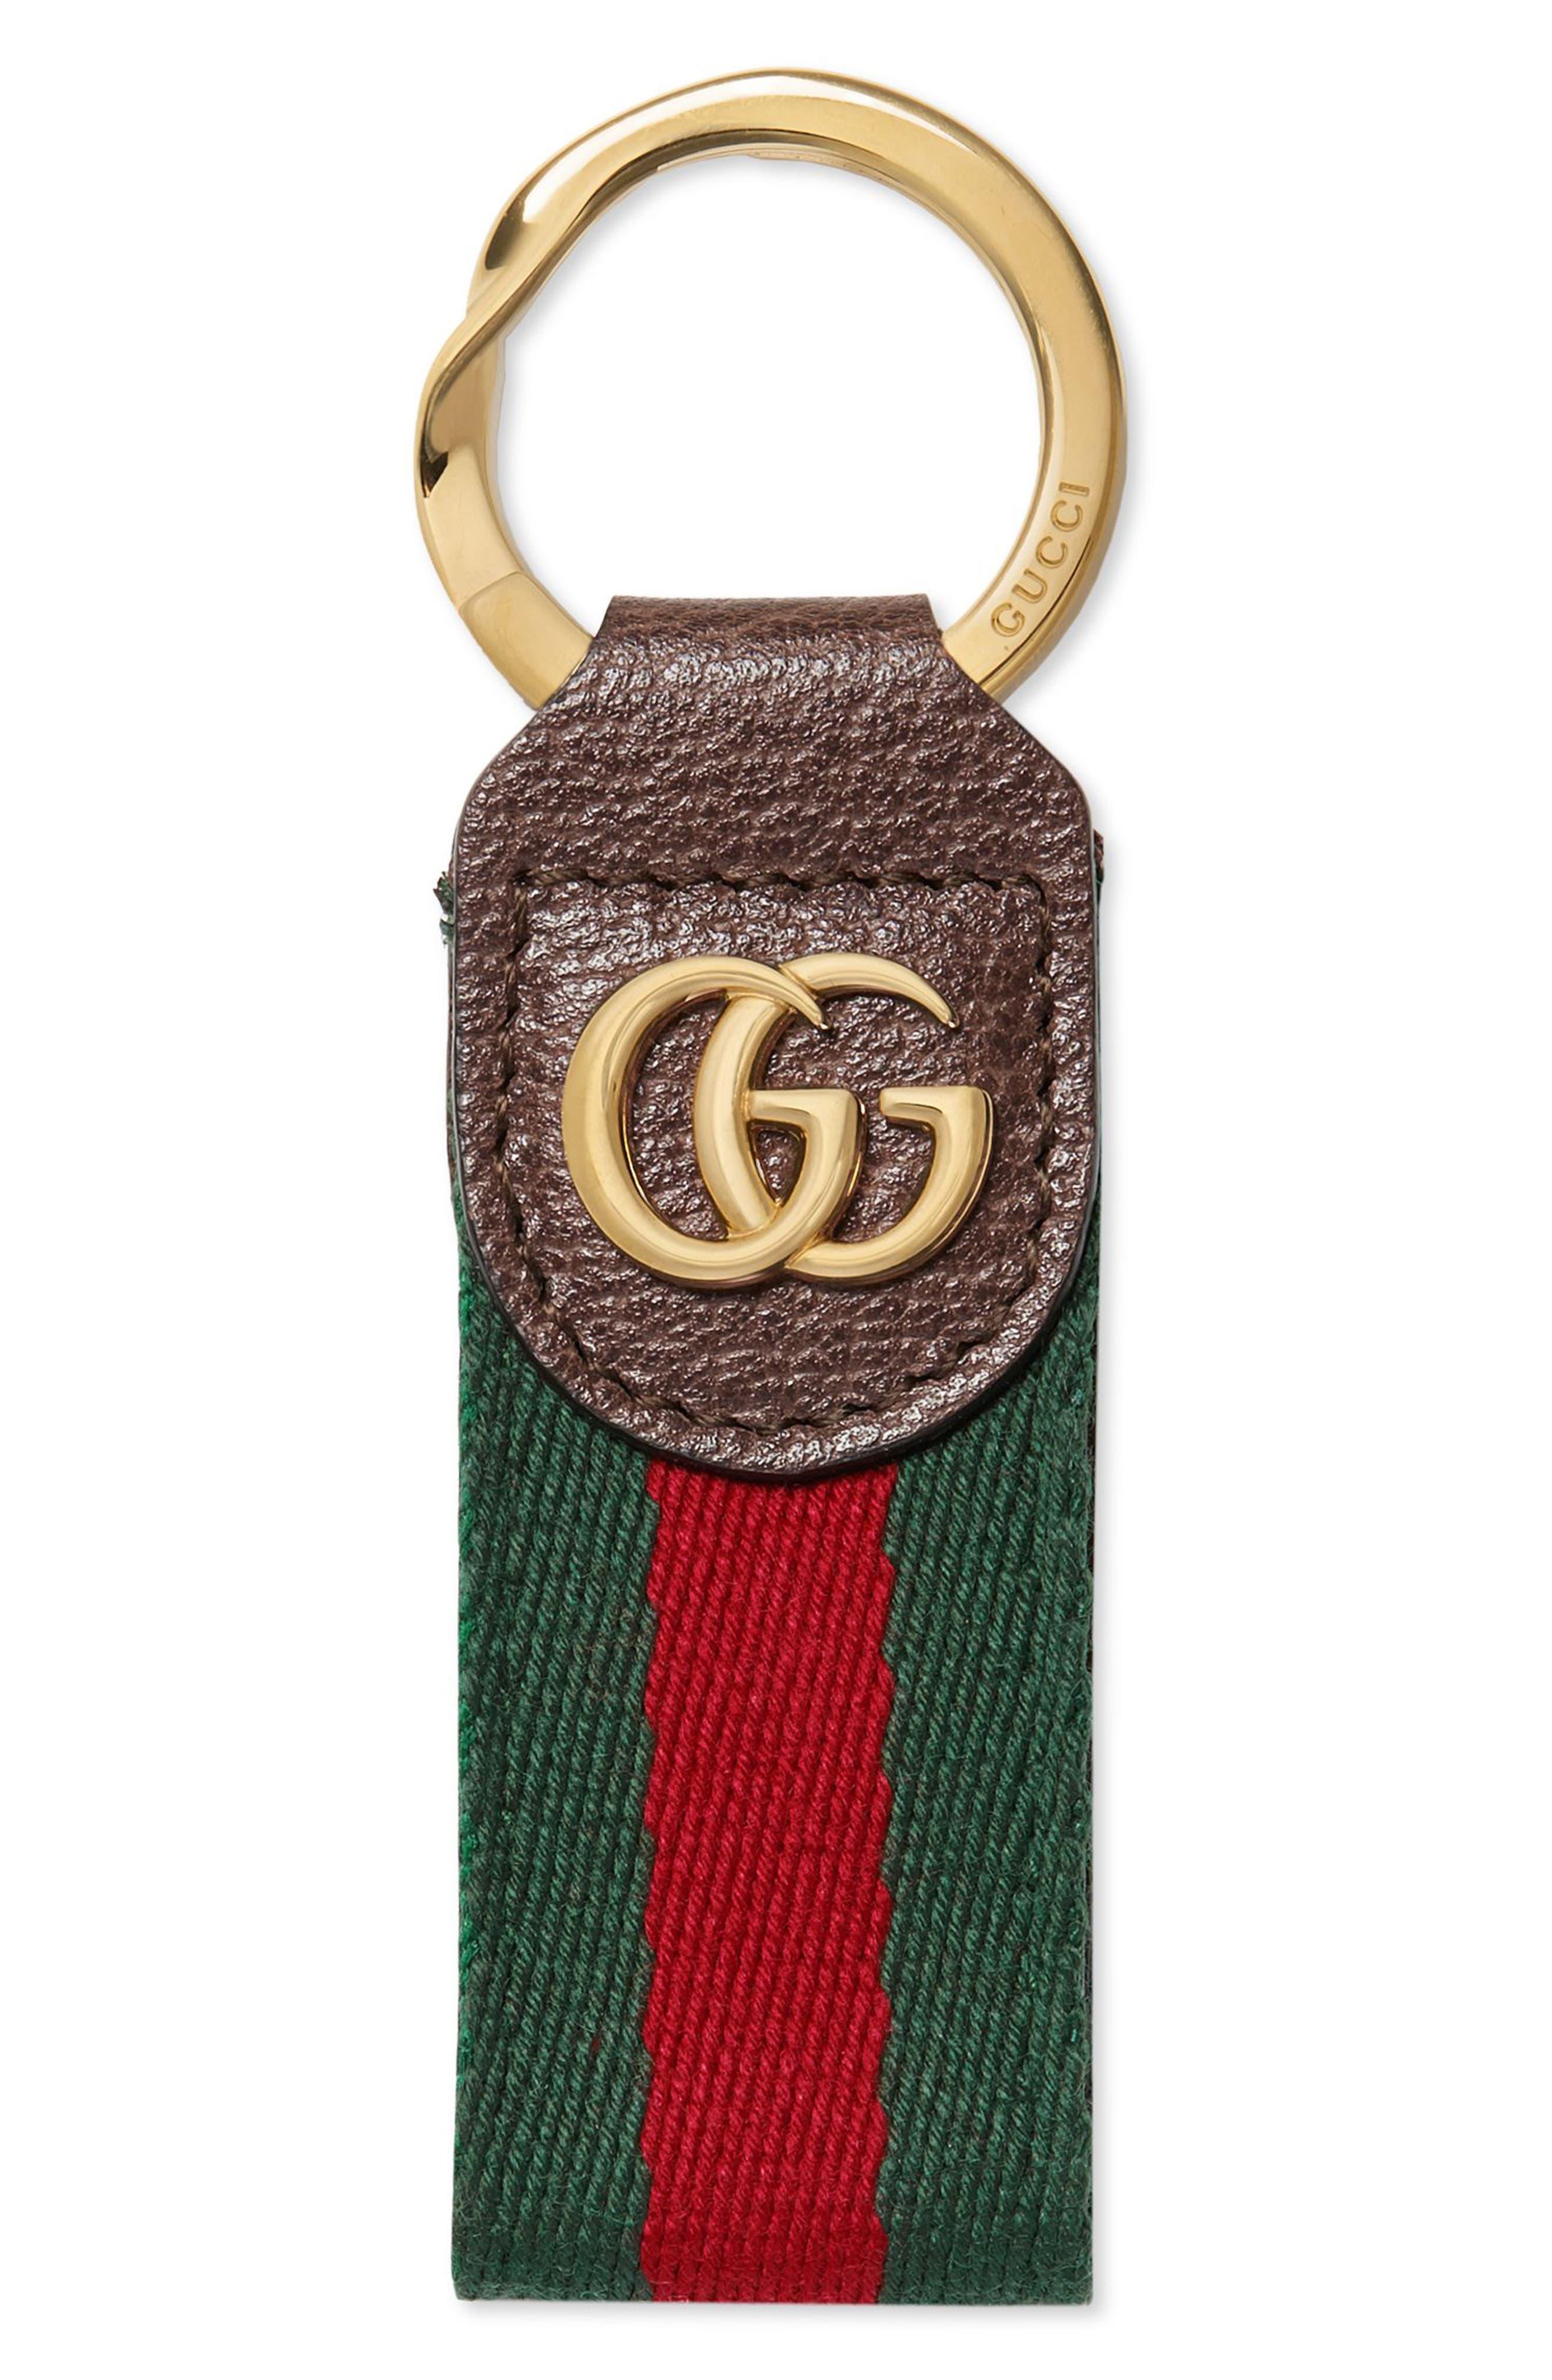 Double-G Web Key Chain,                             Main thumbnail 1, color,                             205